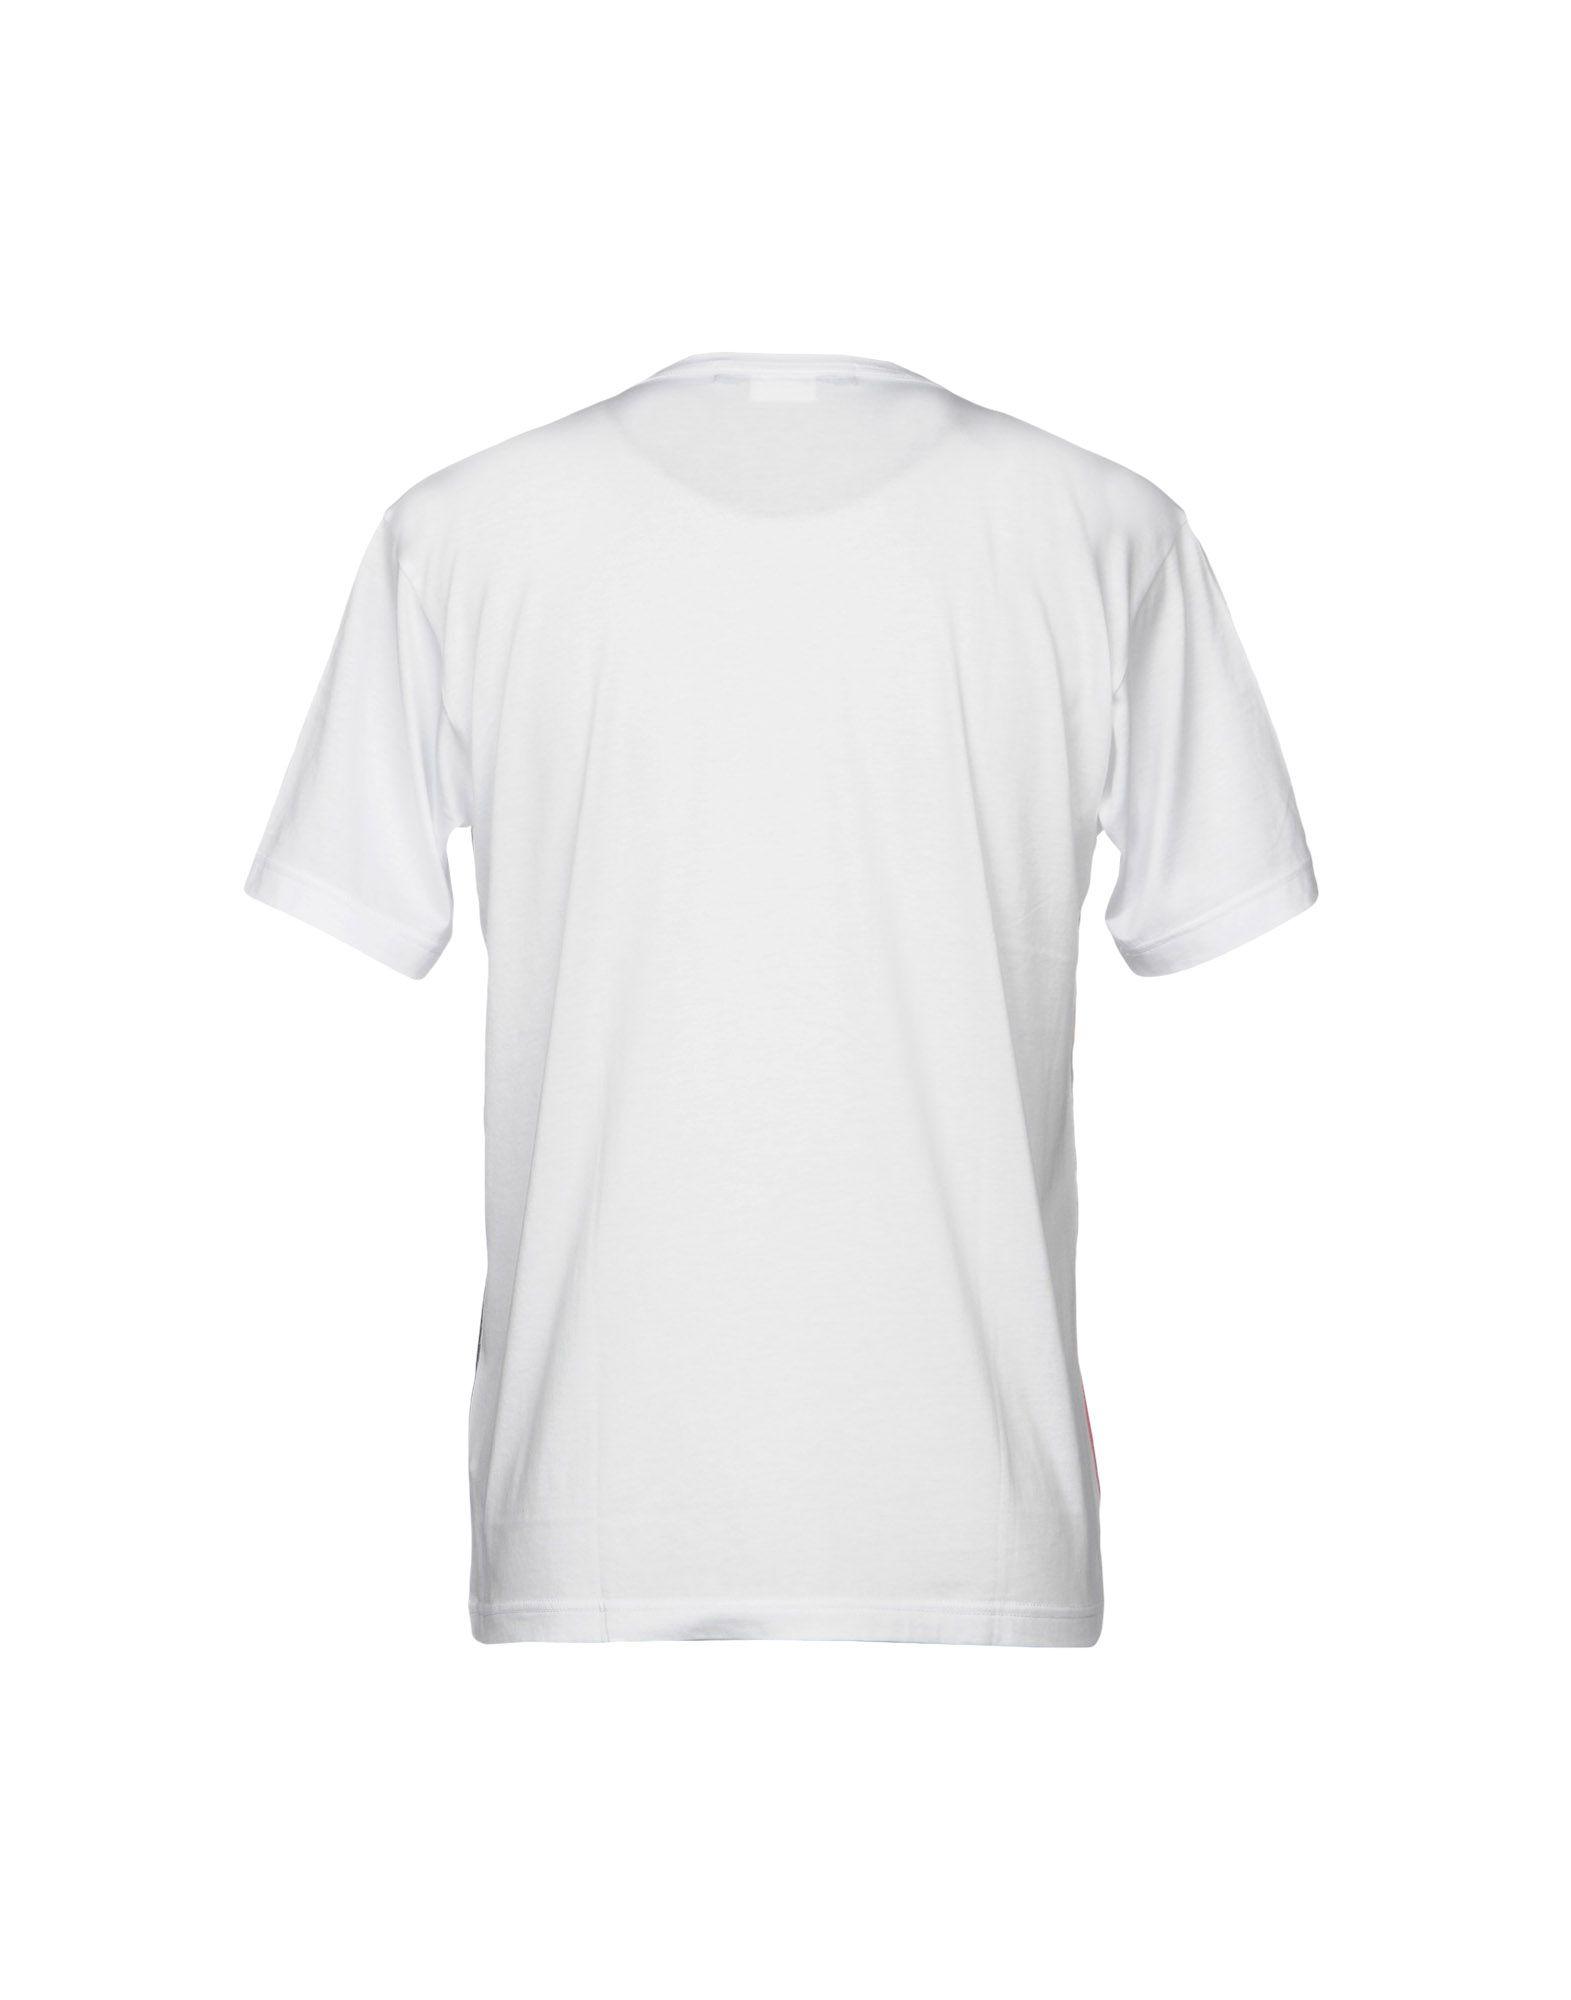 T-Shirt Junya Watanabe Comme Des Gar ons Man Uomo - 12118013EN 12118013EN - 6e8662